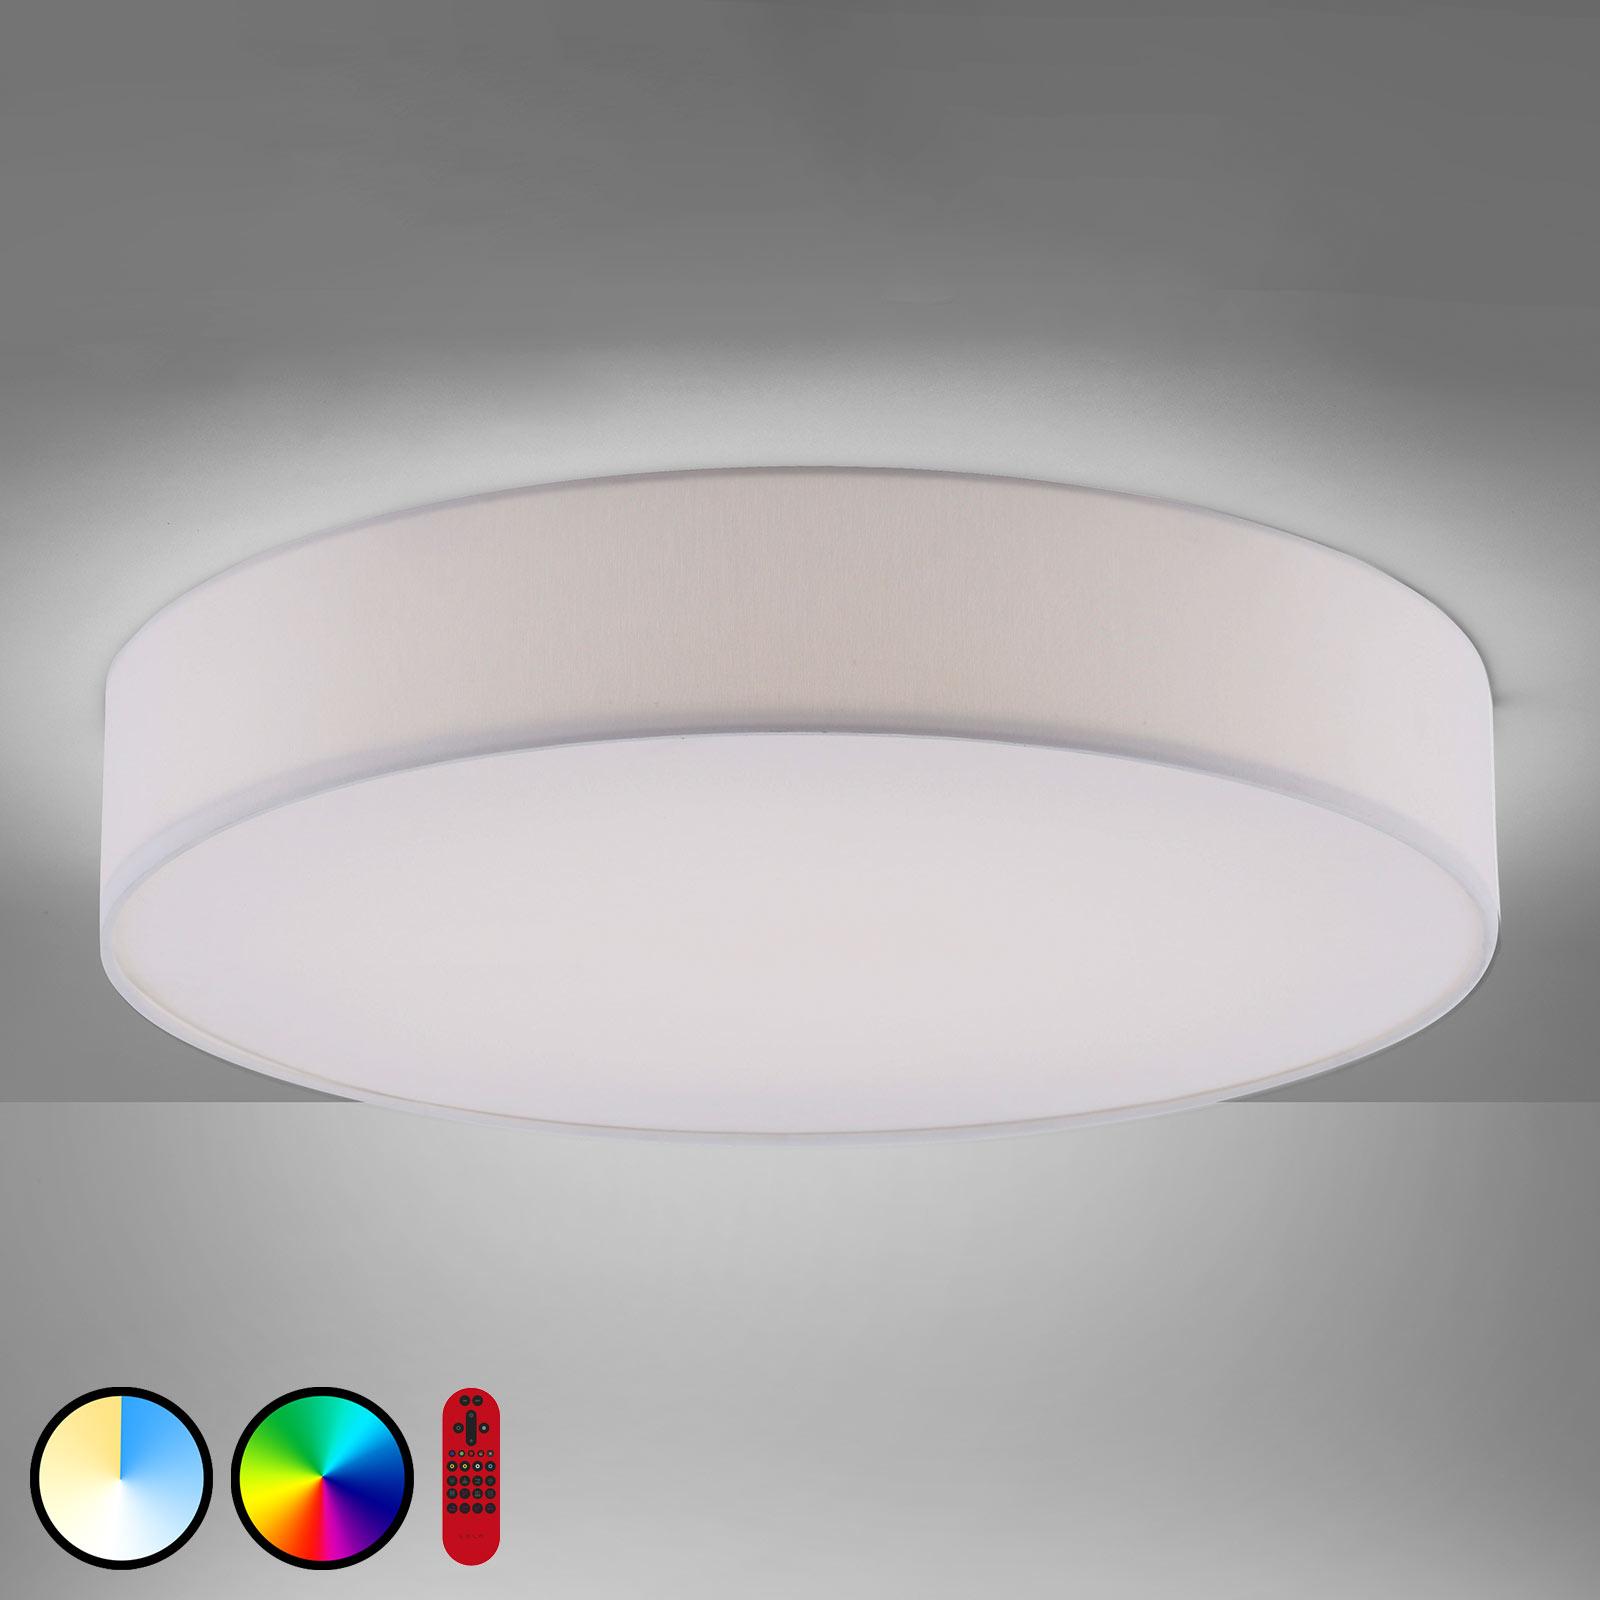 Lampa sufitowa LED LOLAsmart Kiara, Ø 58 cm